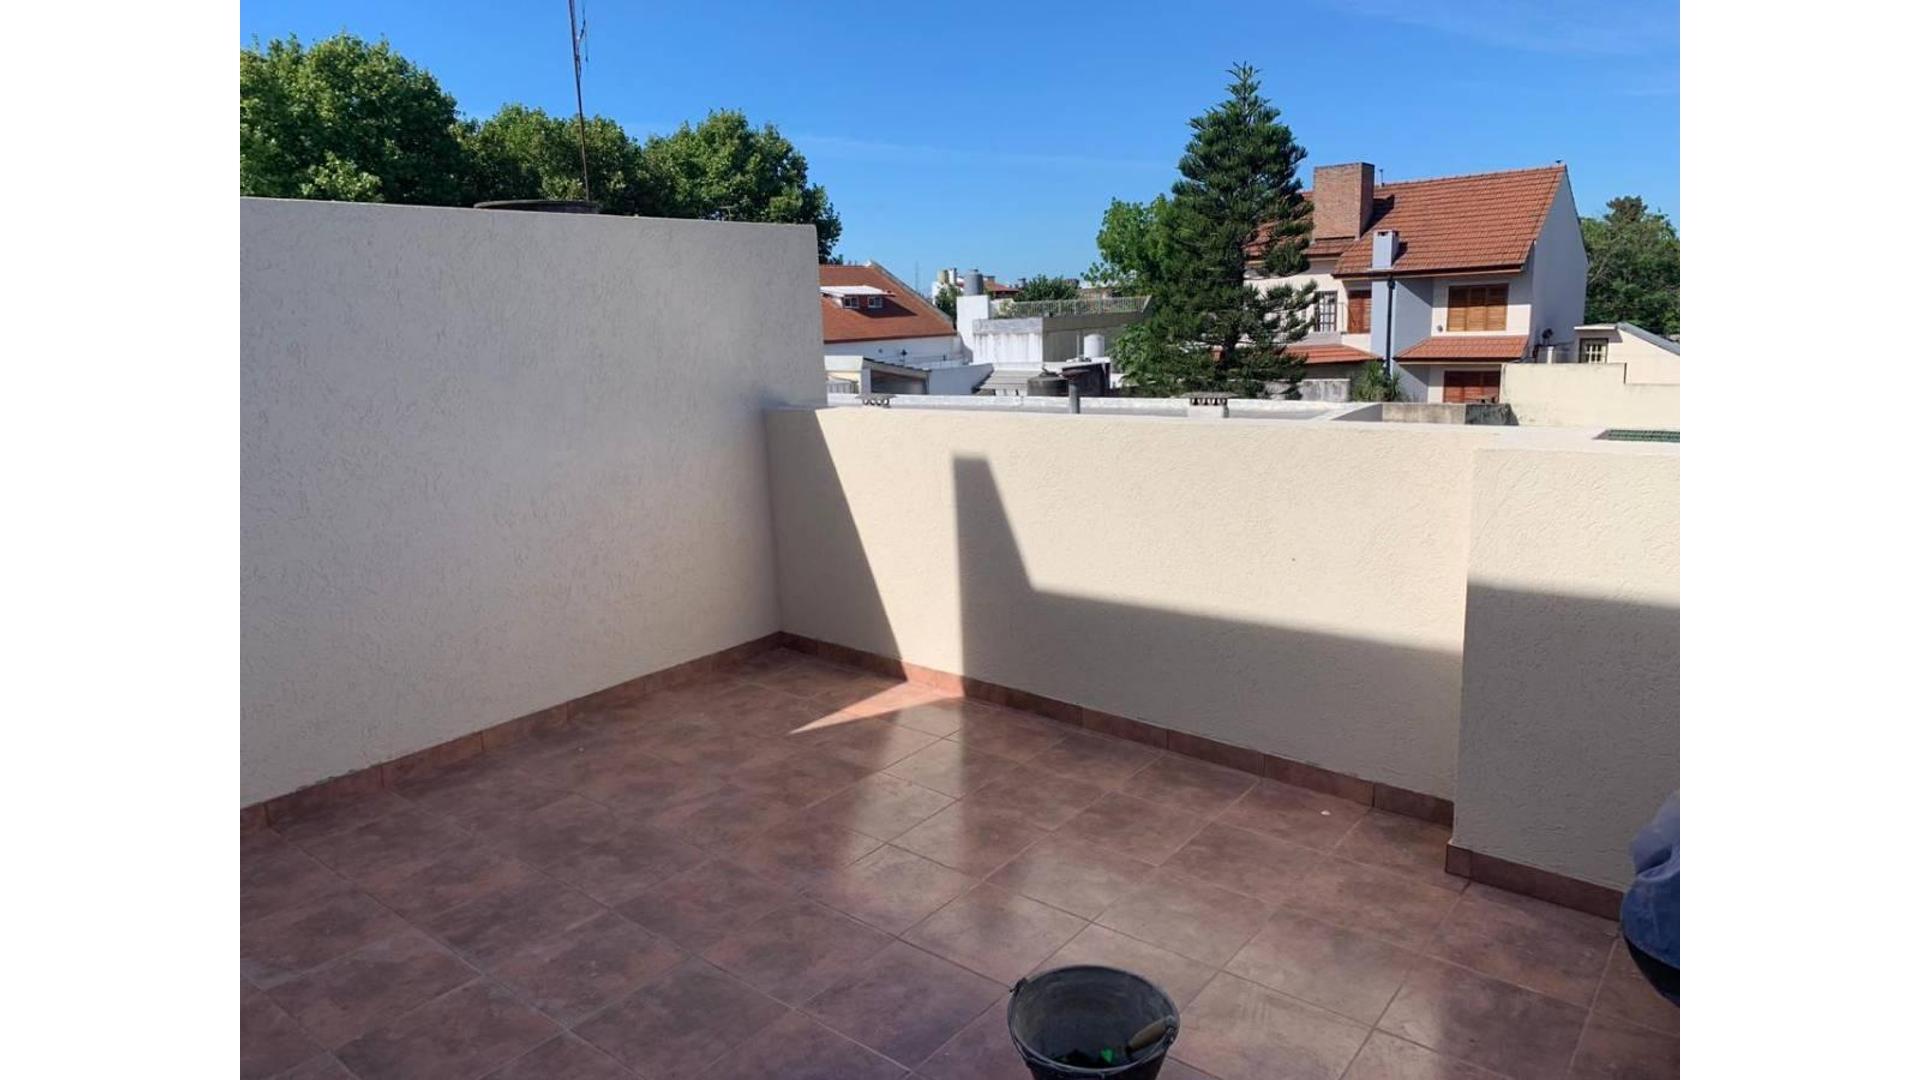 Moliere 2662 - PH 3 Amb con terraza propia sin expensas.